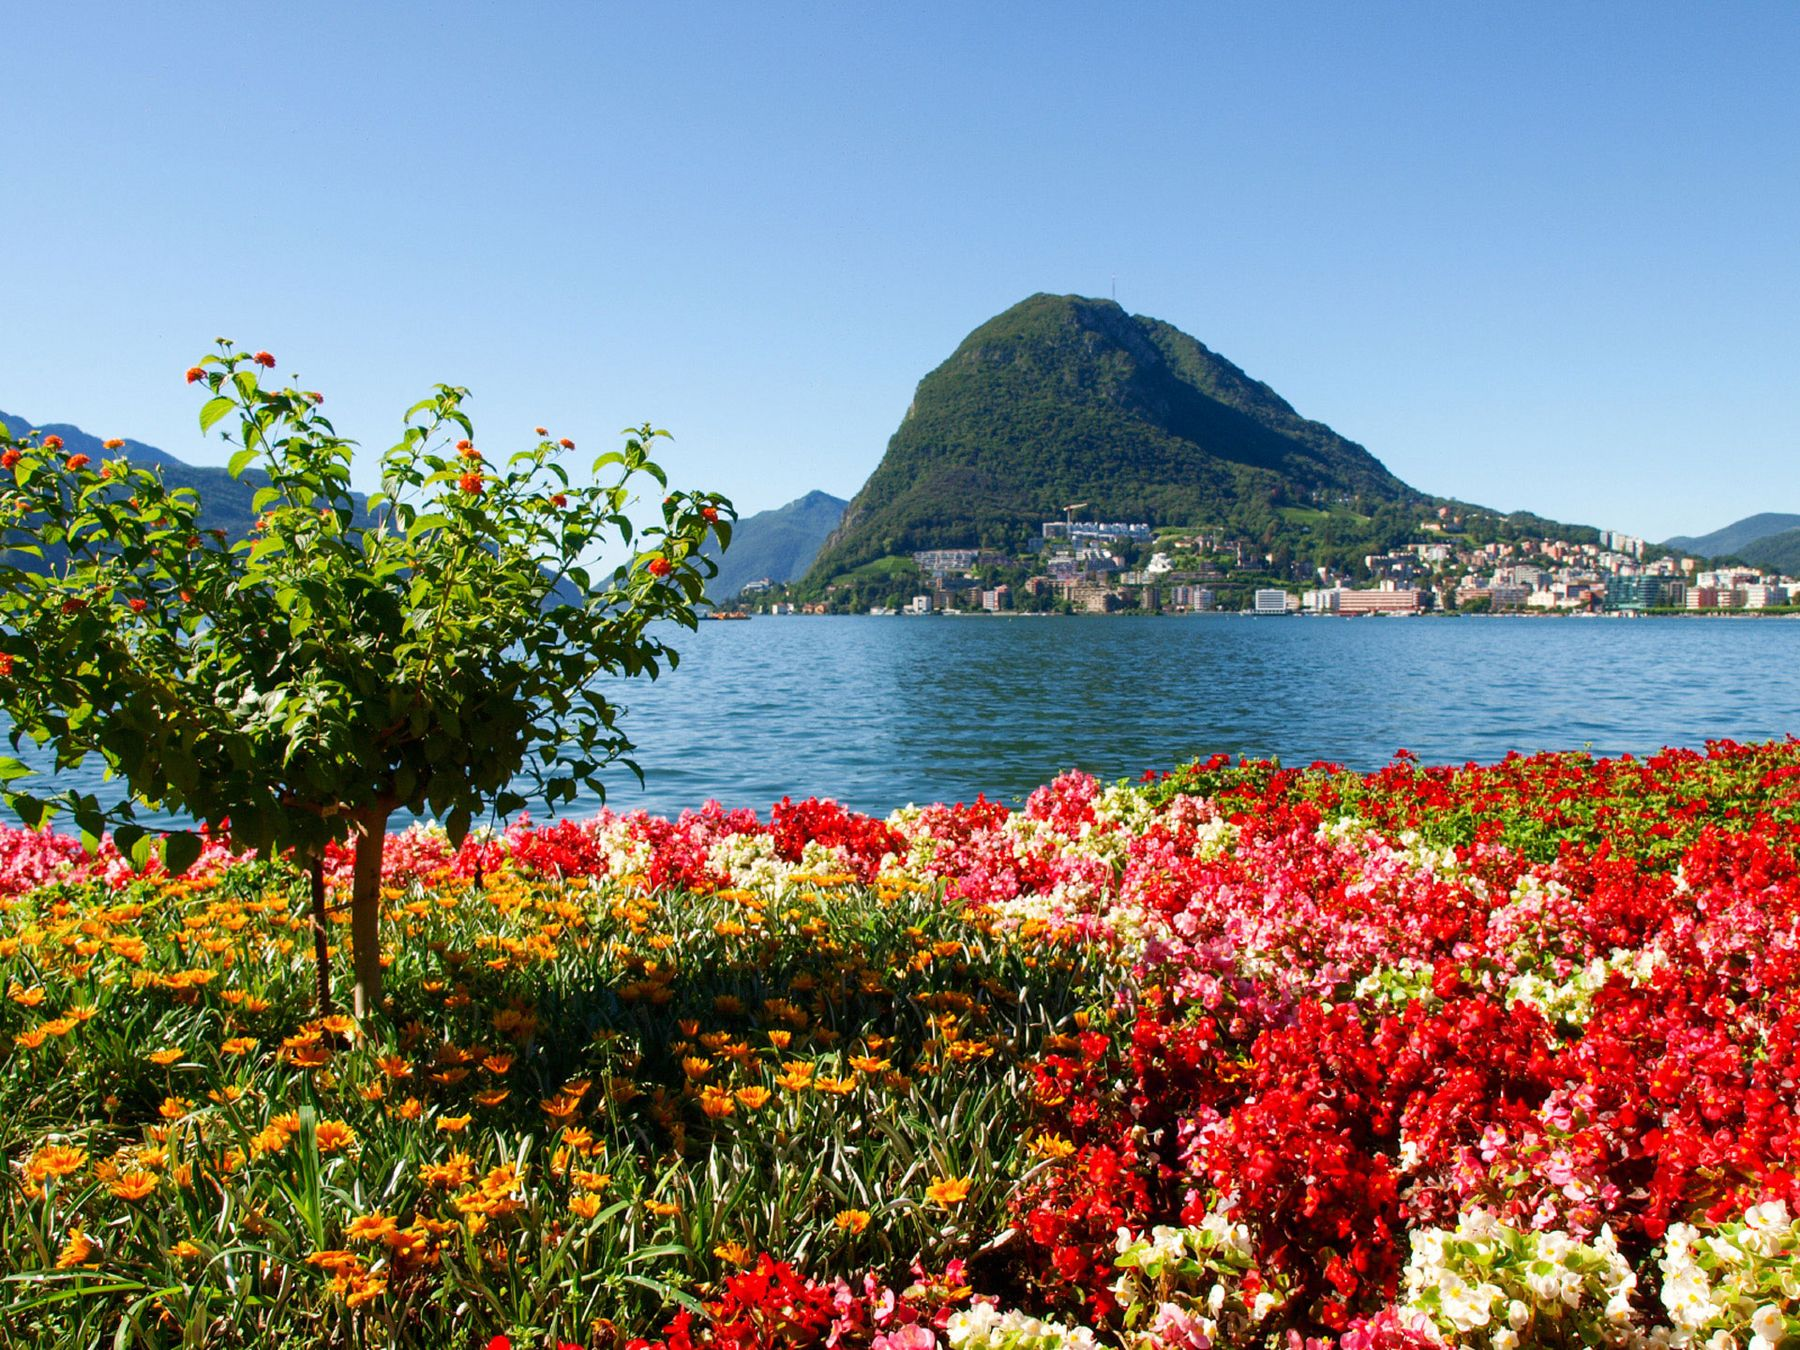 Lugano monte san salvatore web